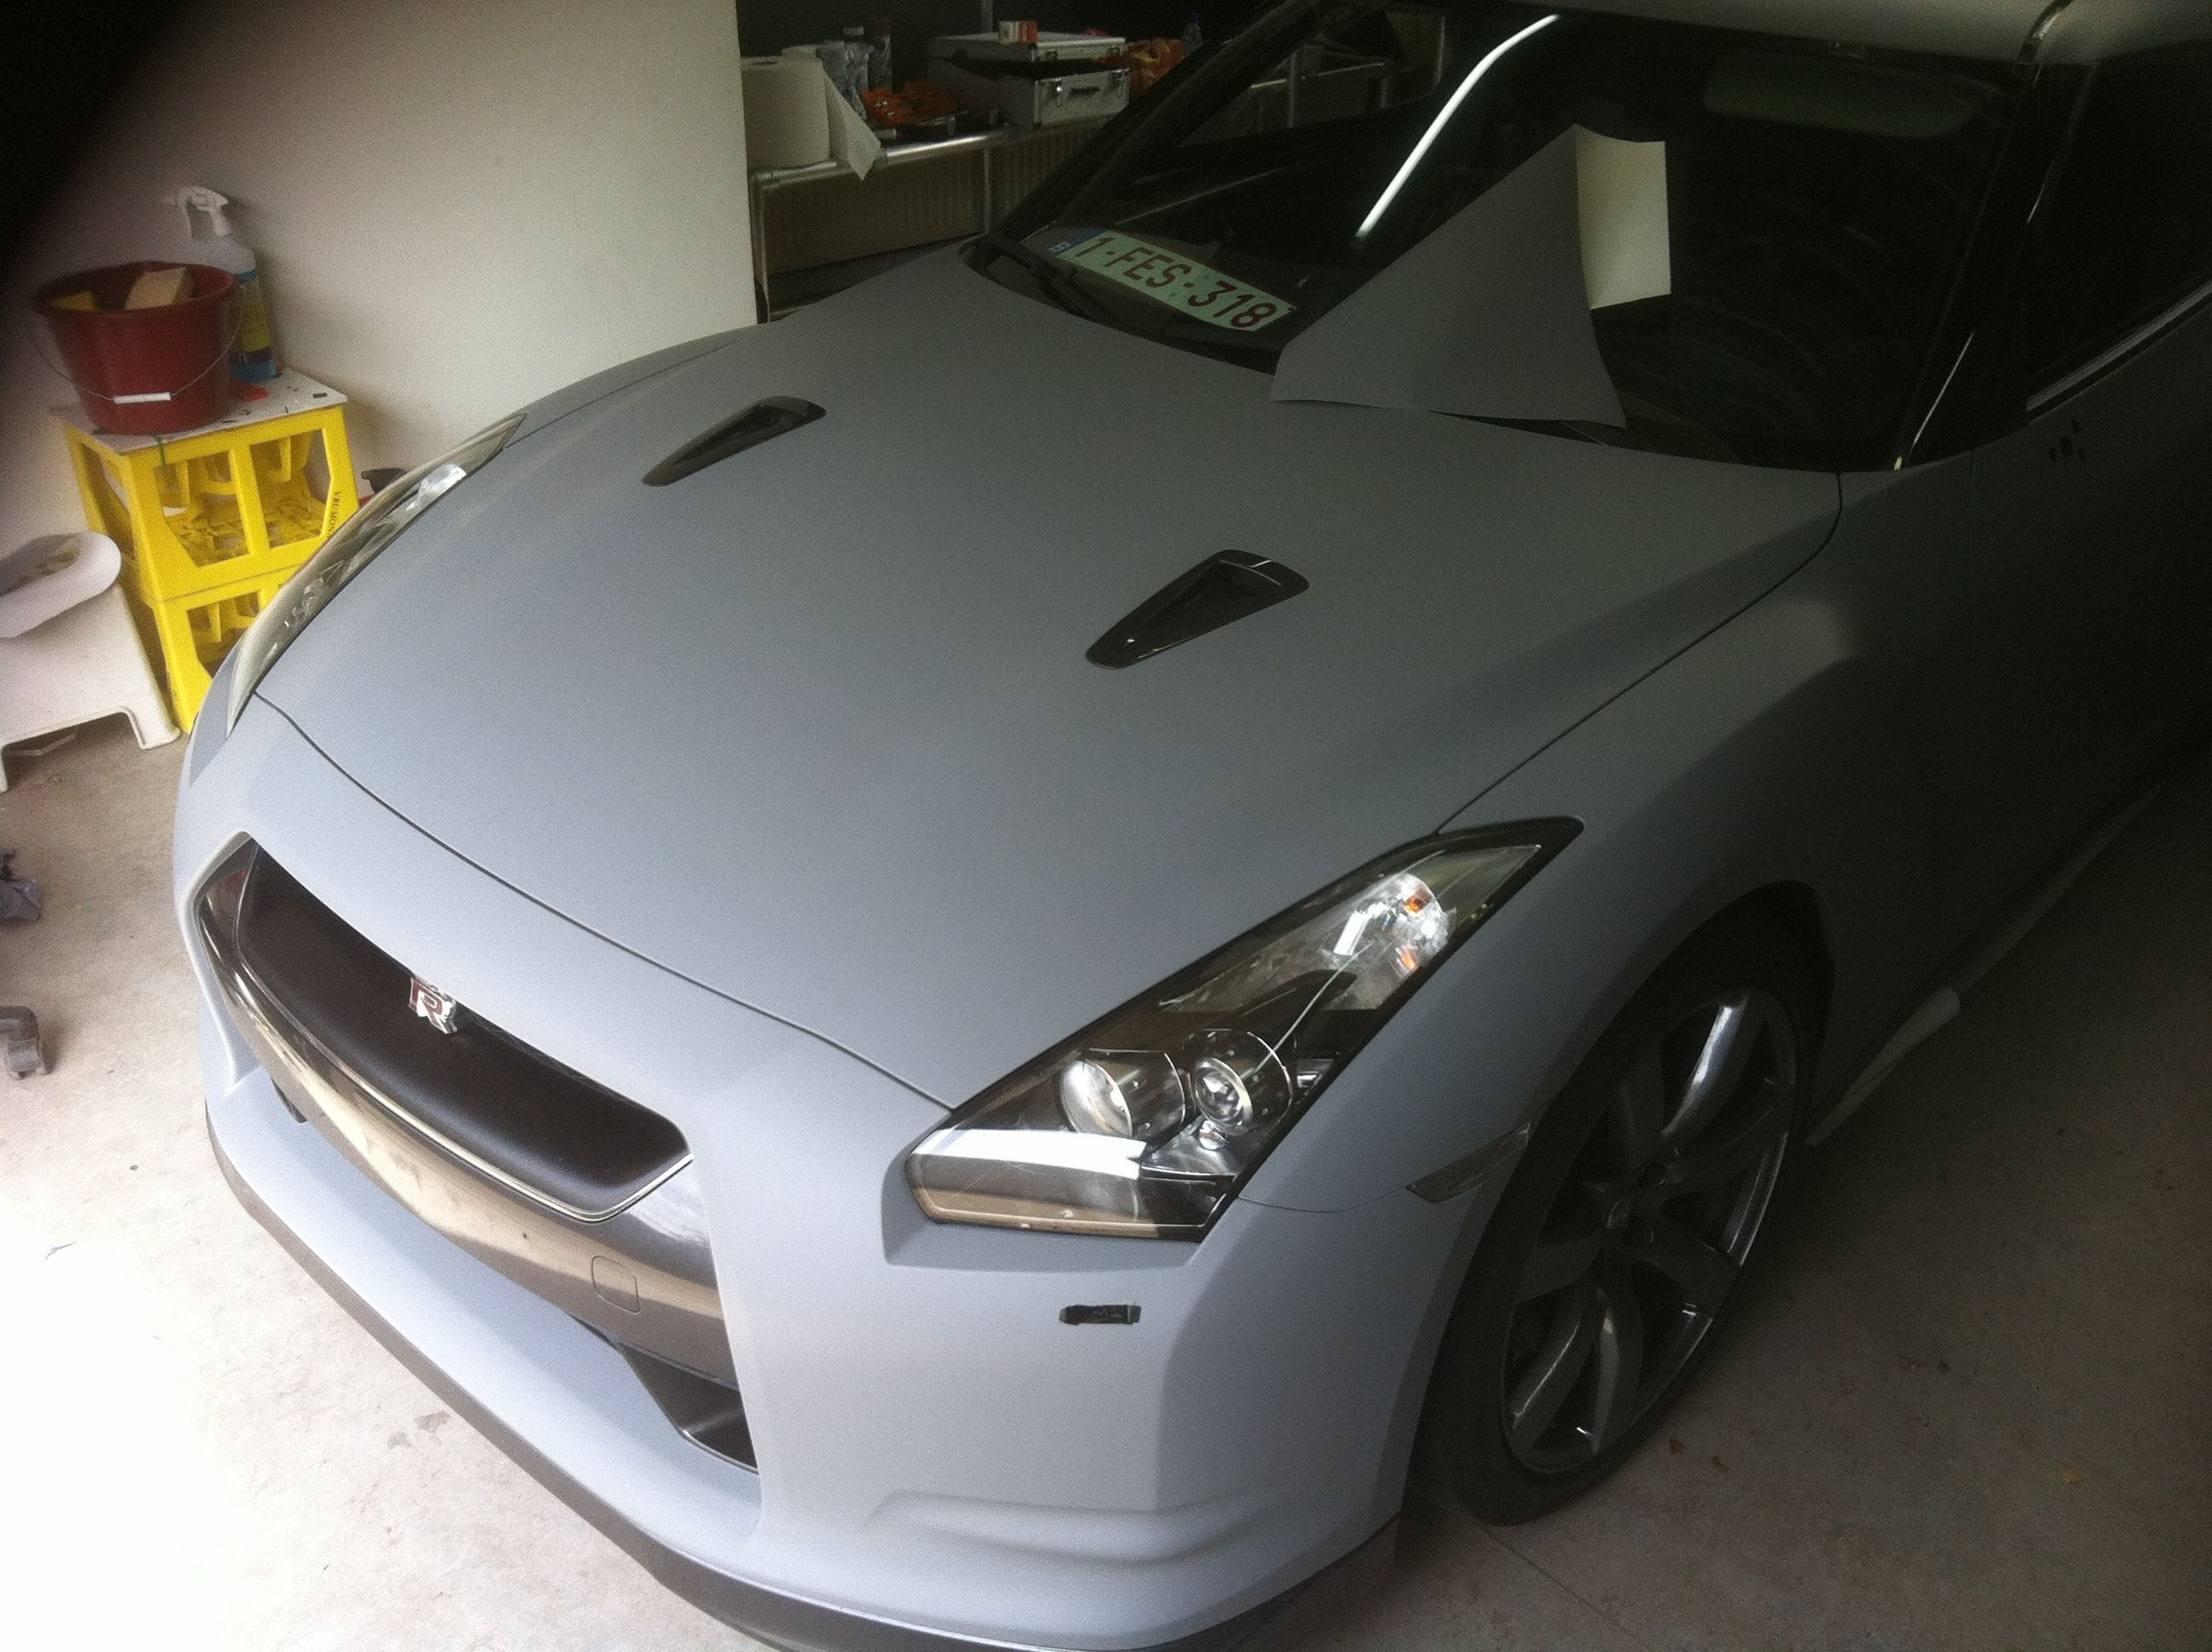 Nissan GT-R met Mat Grijze Wrap, Carwrapping door Wrapmyride.nu Foto-nr:6550, ©2021